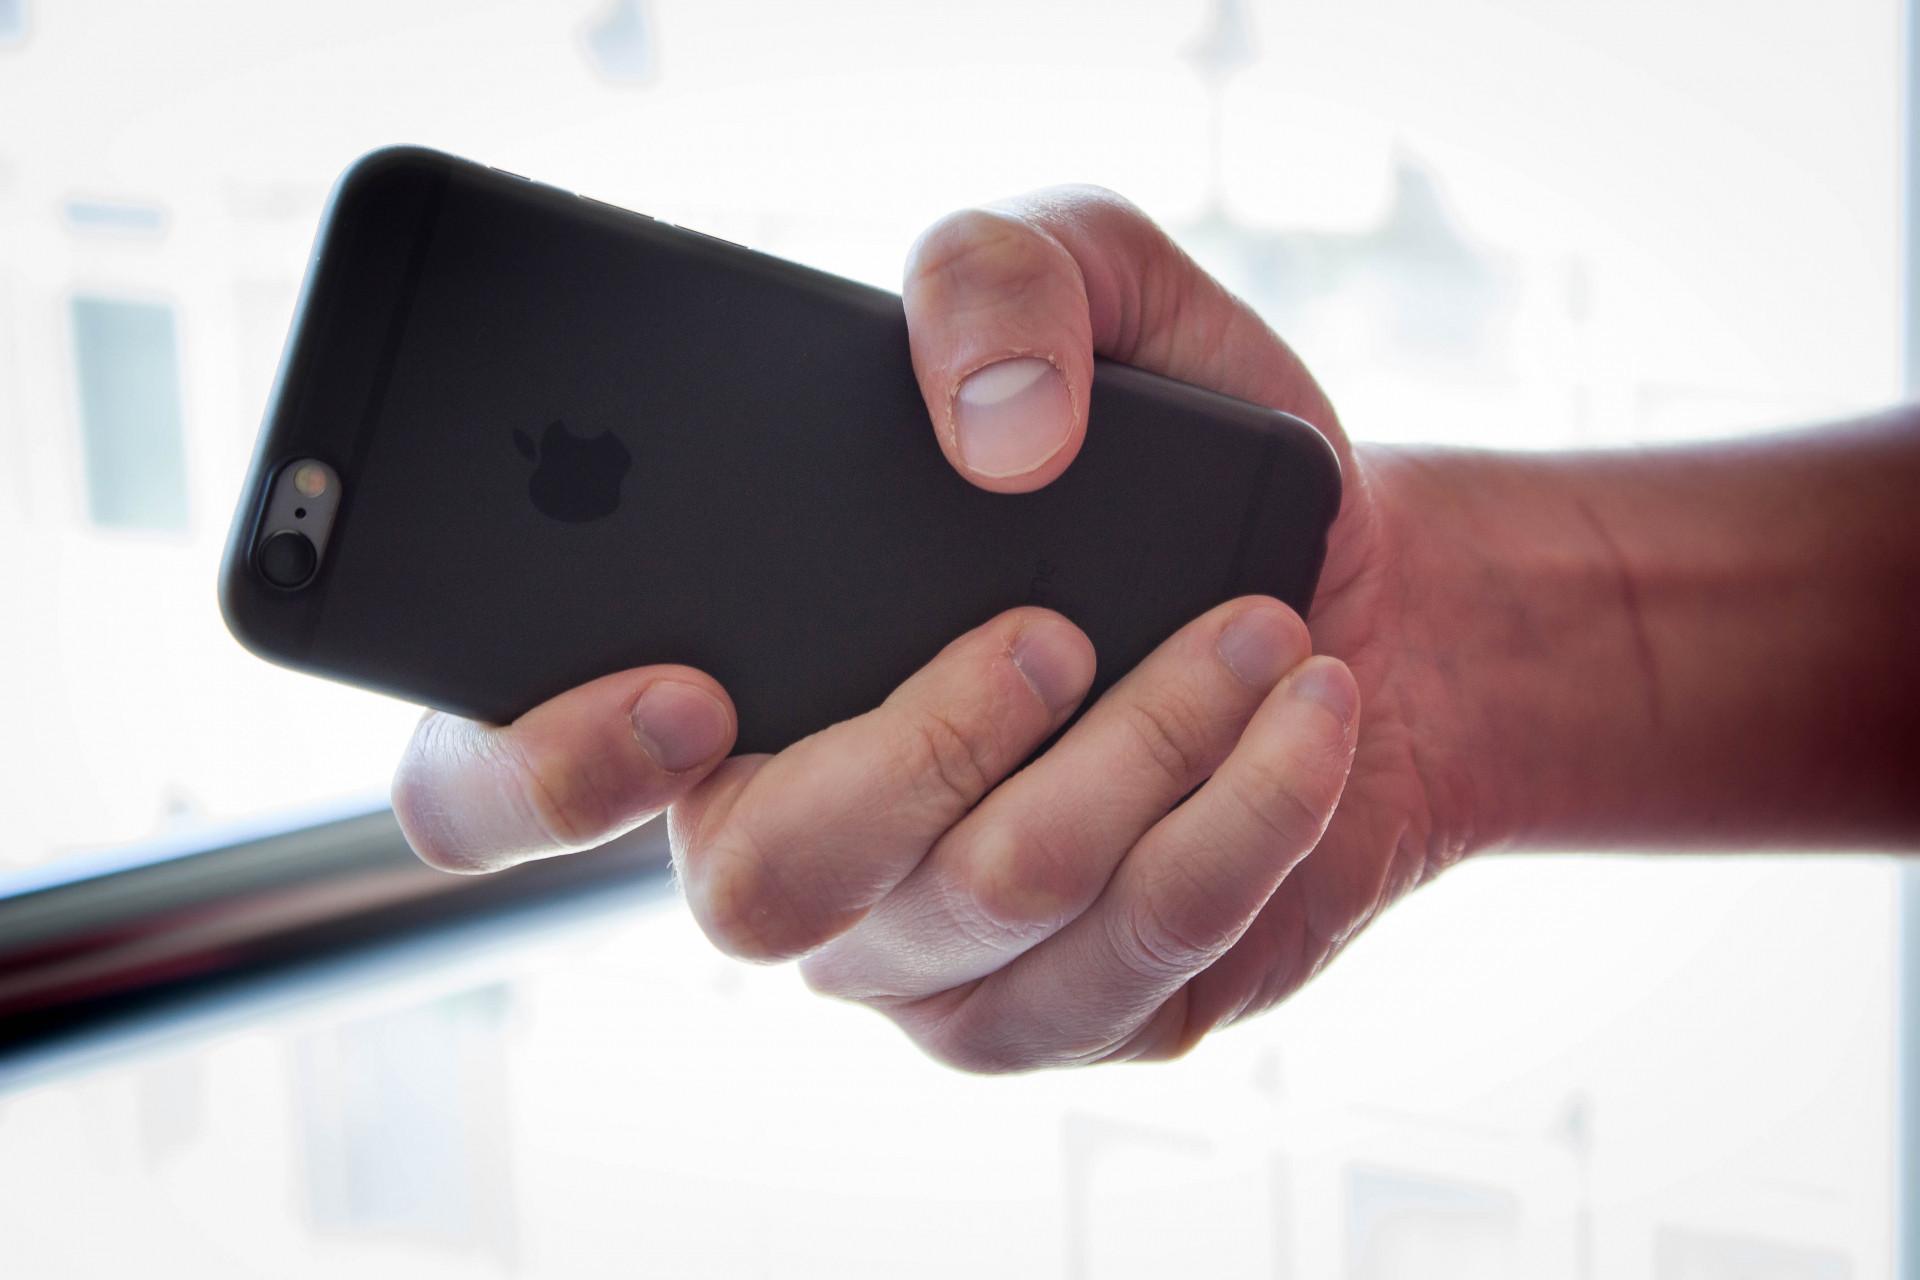 Действия при краже телефона